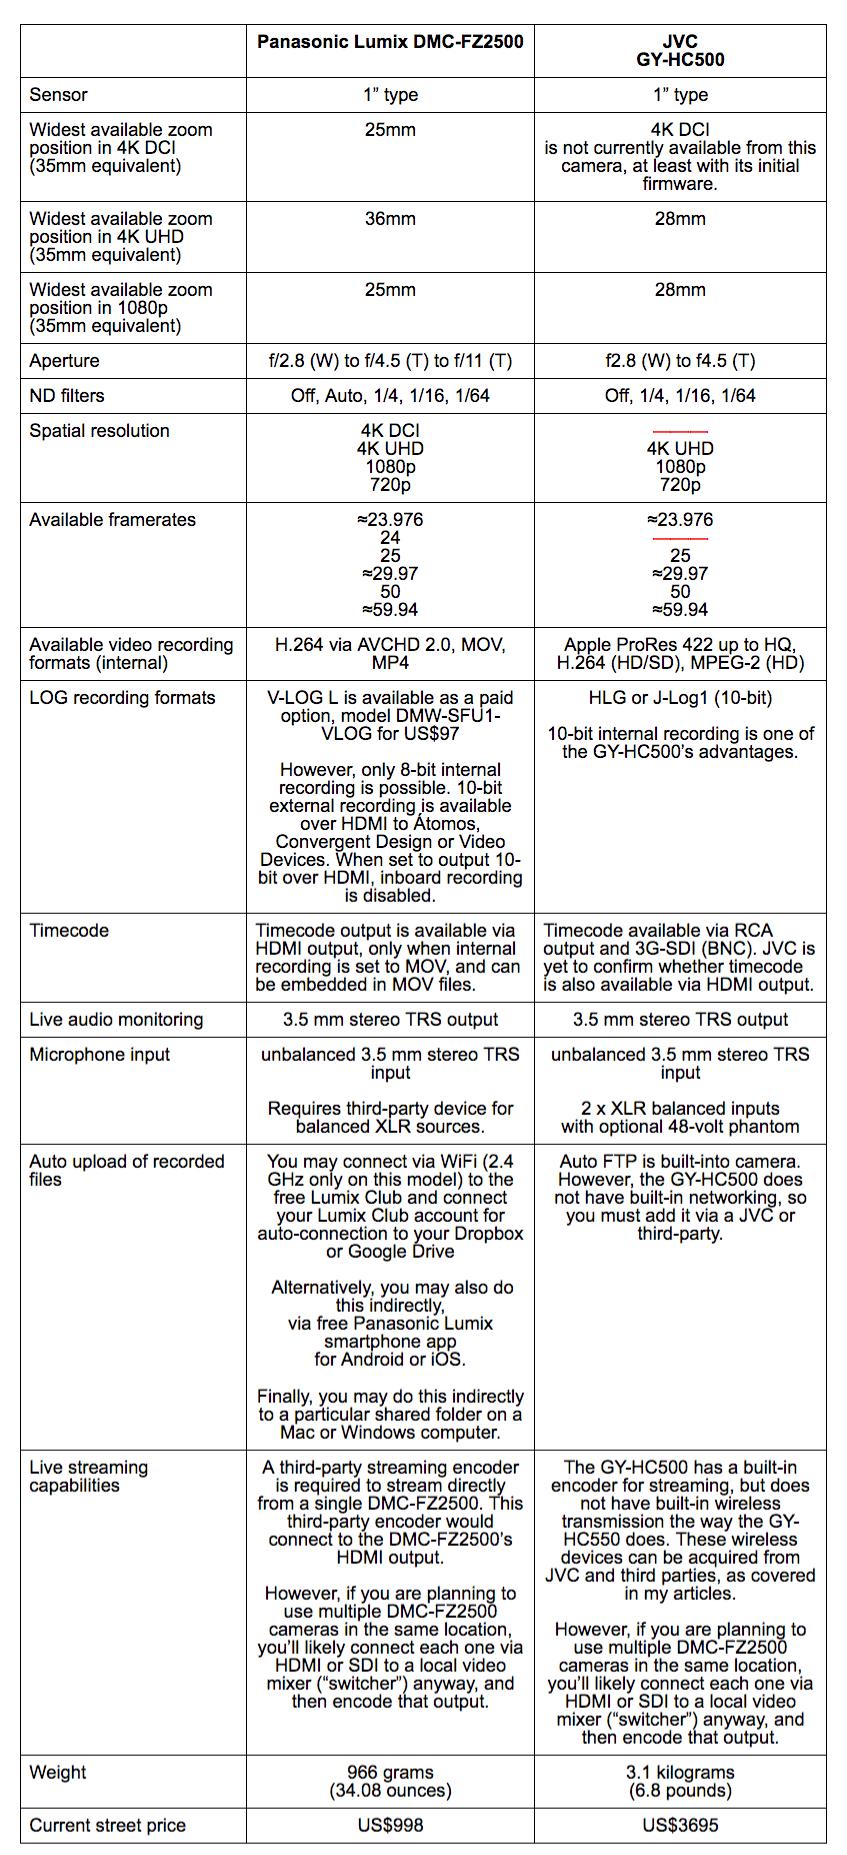 "Compare: Panasonic Lumix DMC-FZ2500 and JVC GY-HC500 1"" type 4K cameras 7"